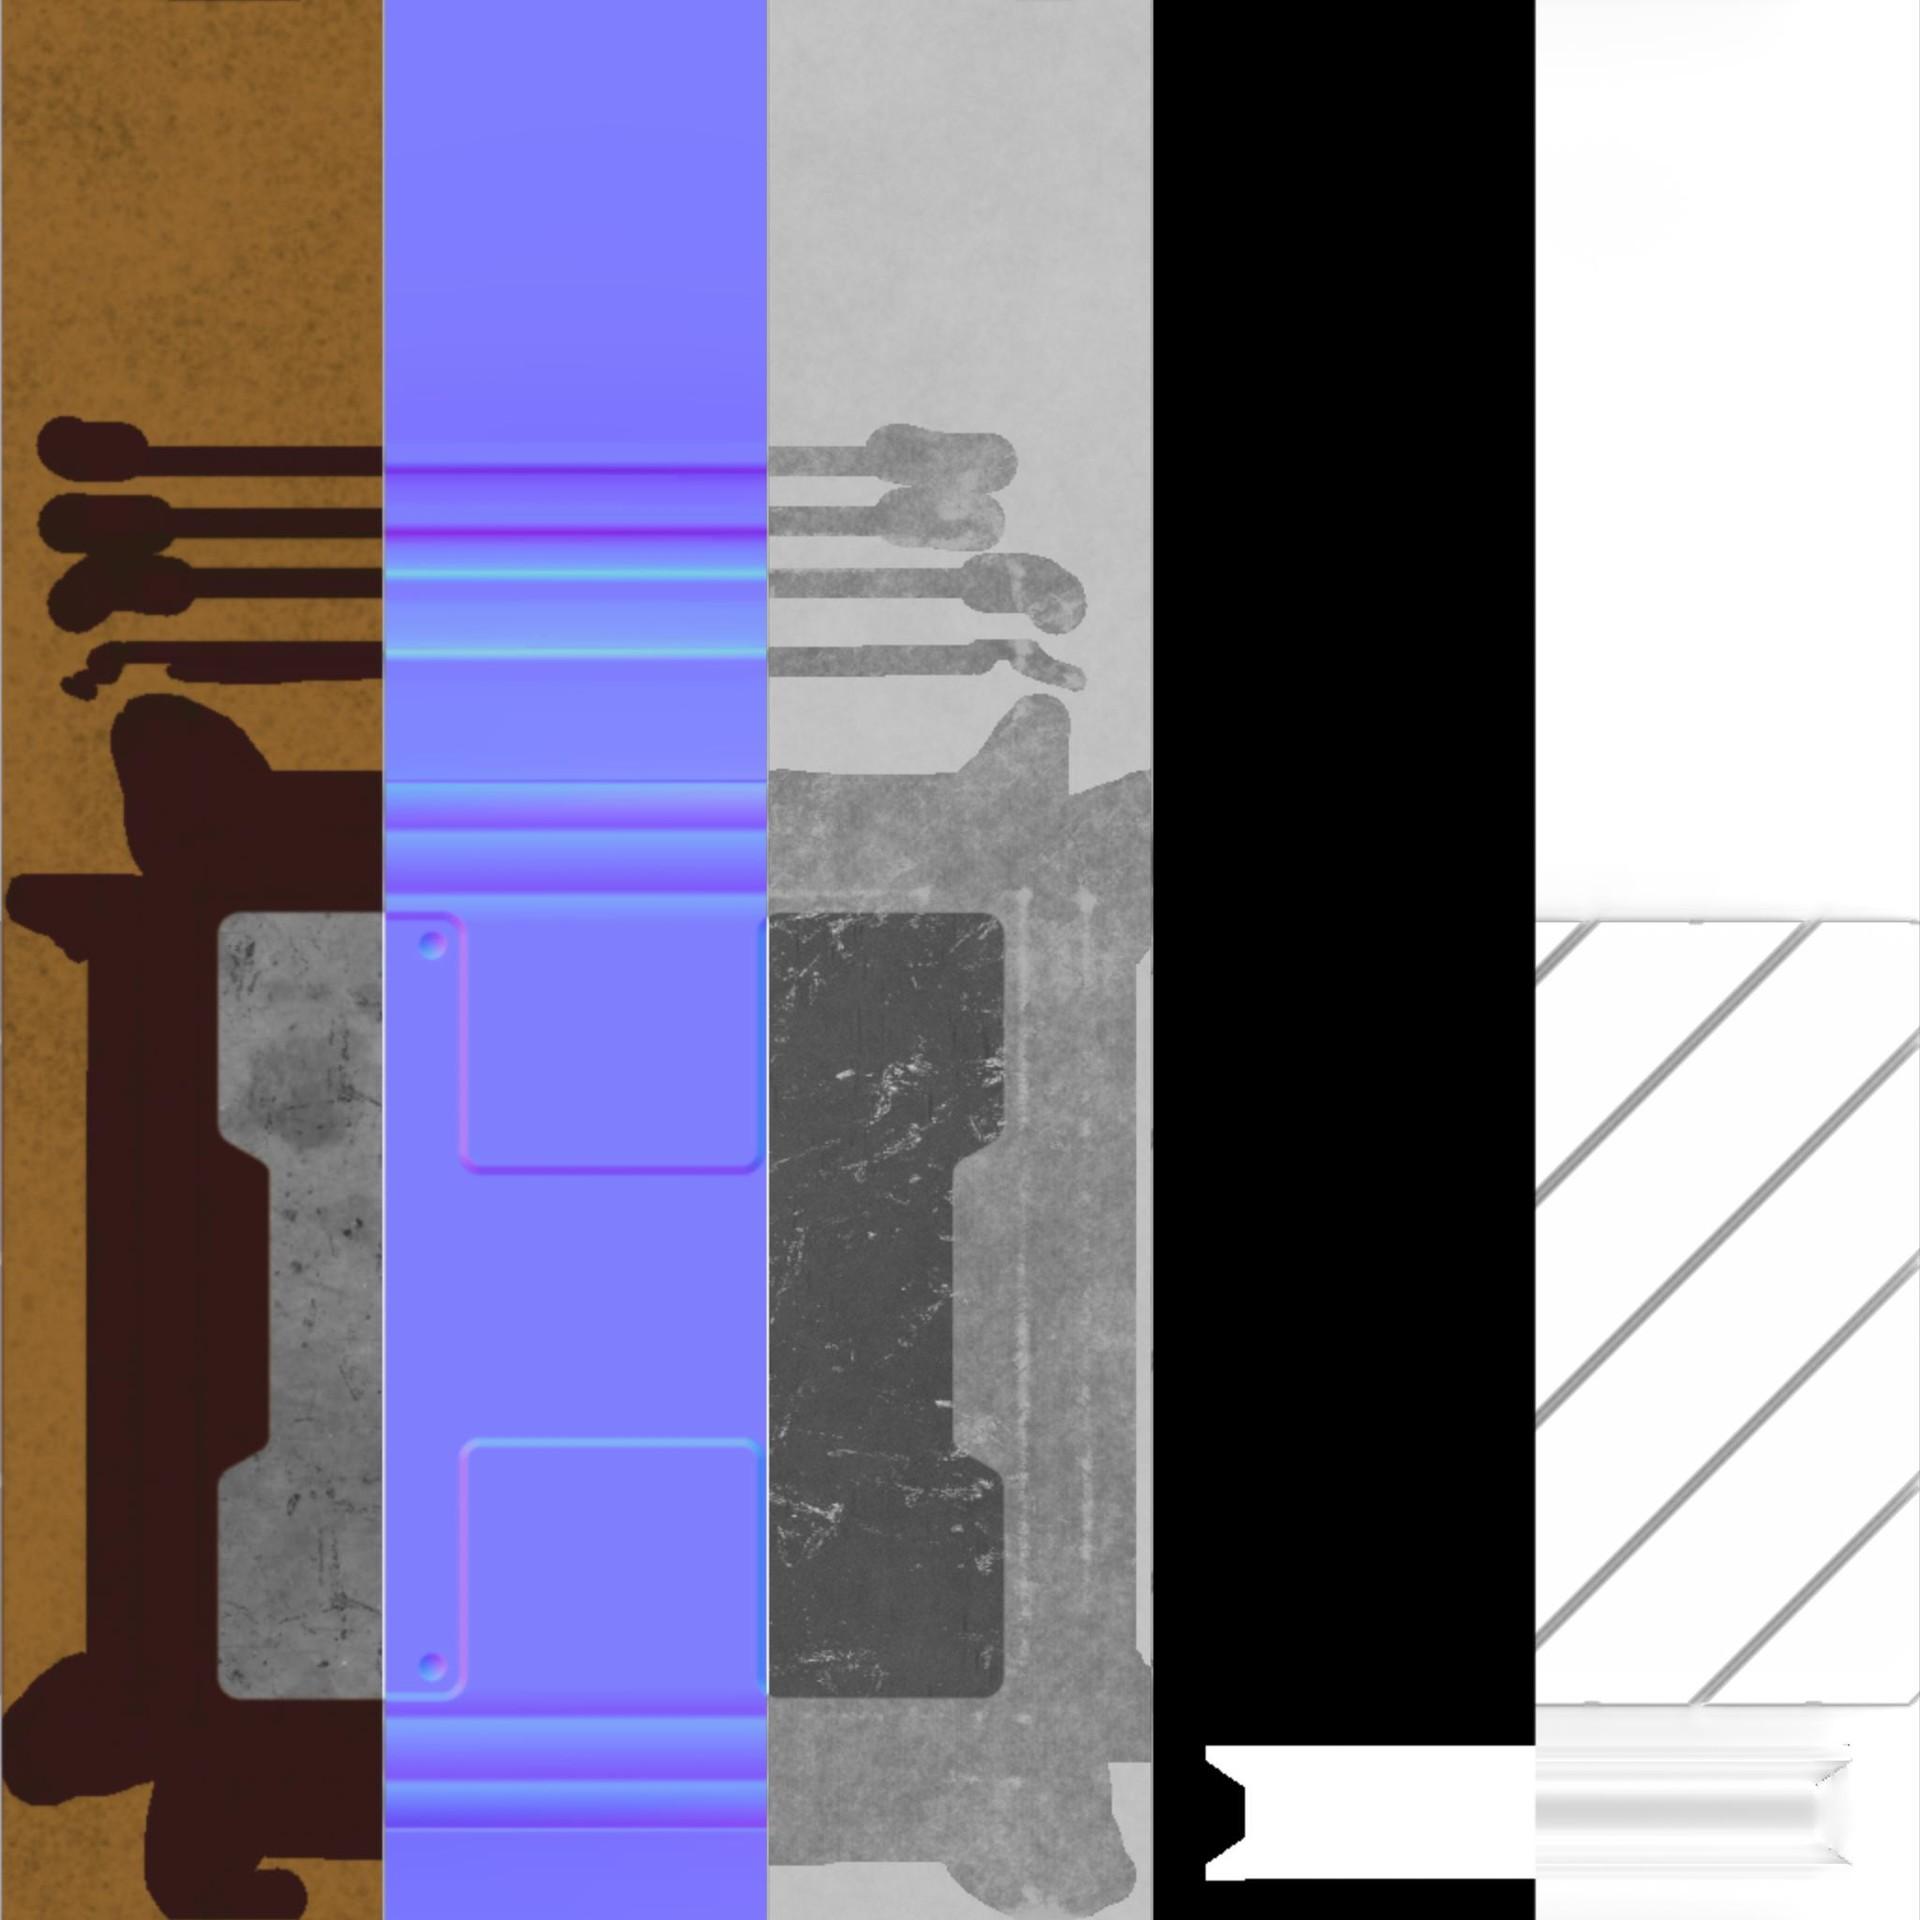 Alex schwartz bolt crate texture cutaway